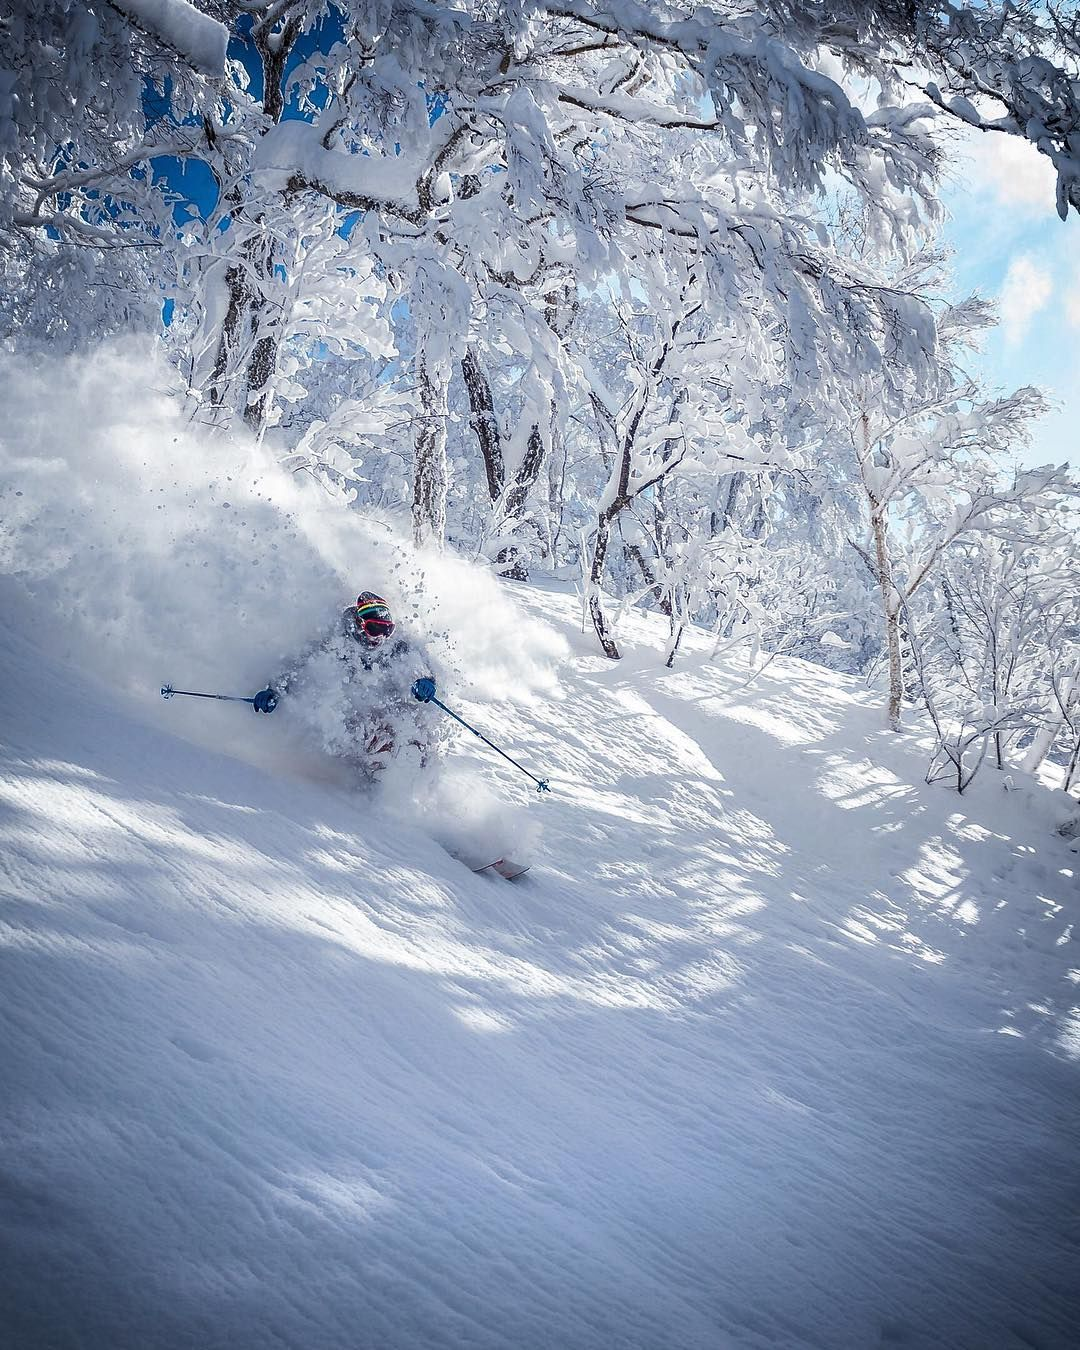 Pin by Bowsquat on Ski bummin' Free skiing, Alpine